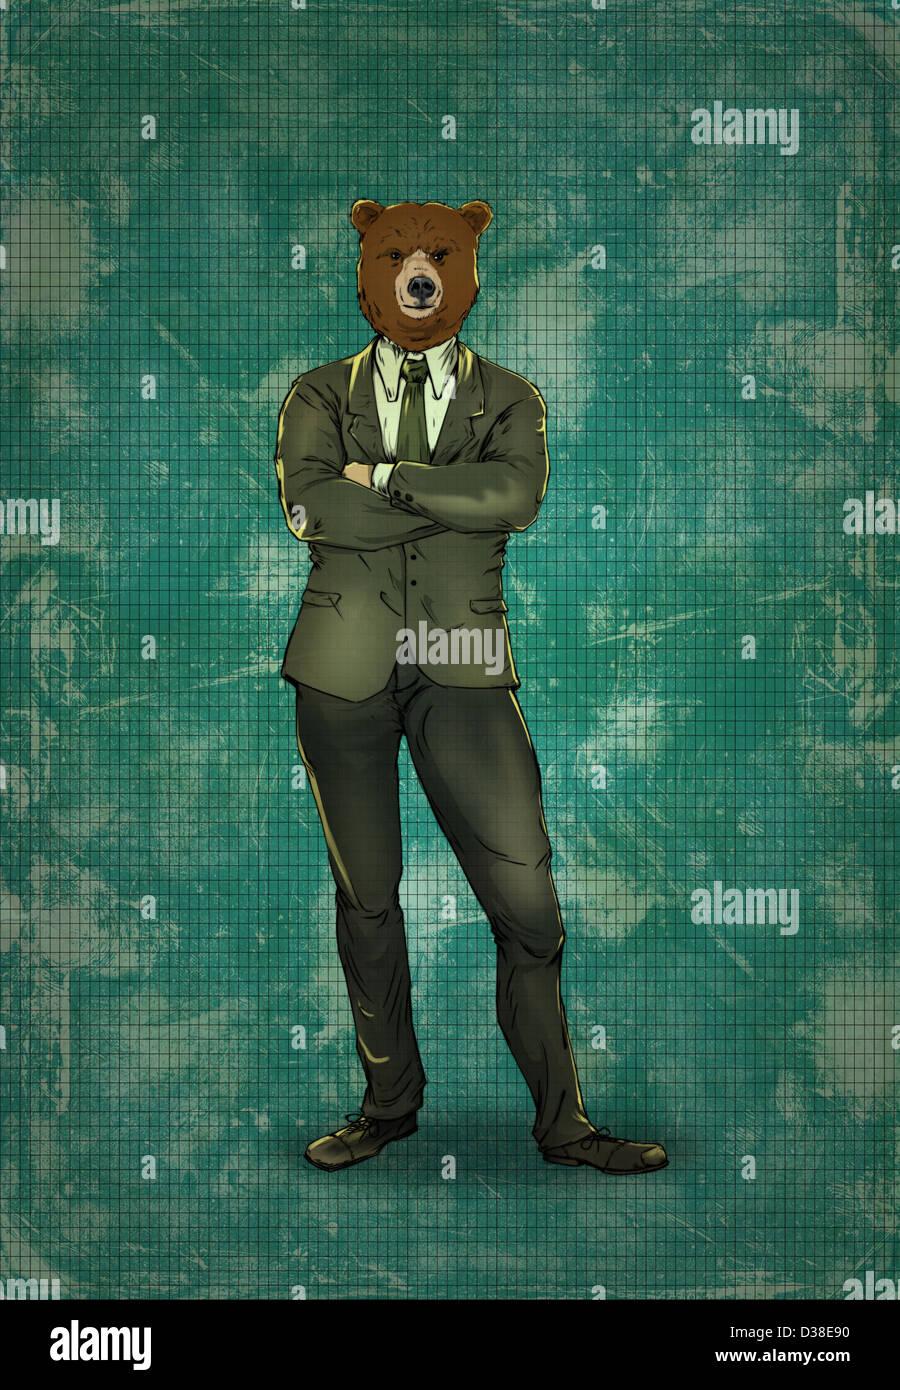 Illustrative image of bearish business man - Stock Image